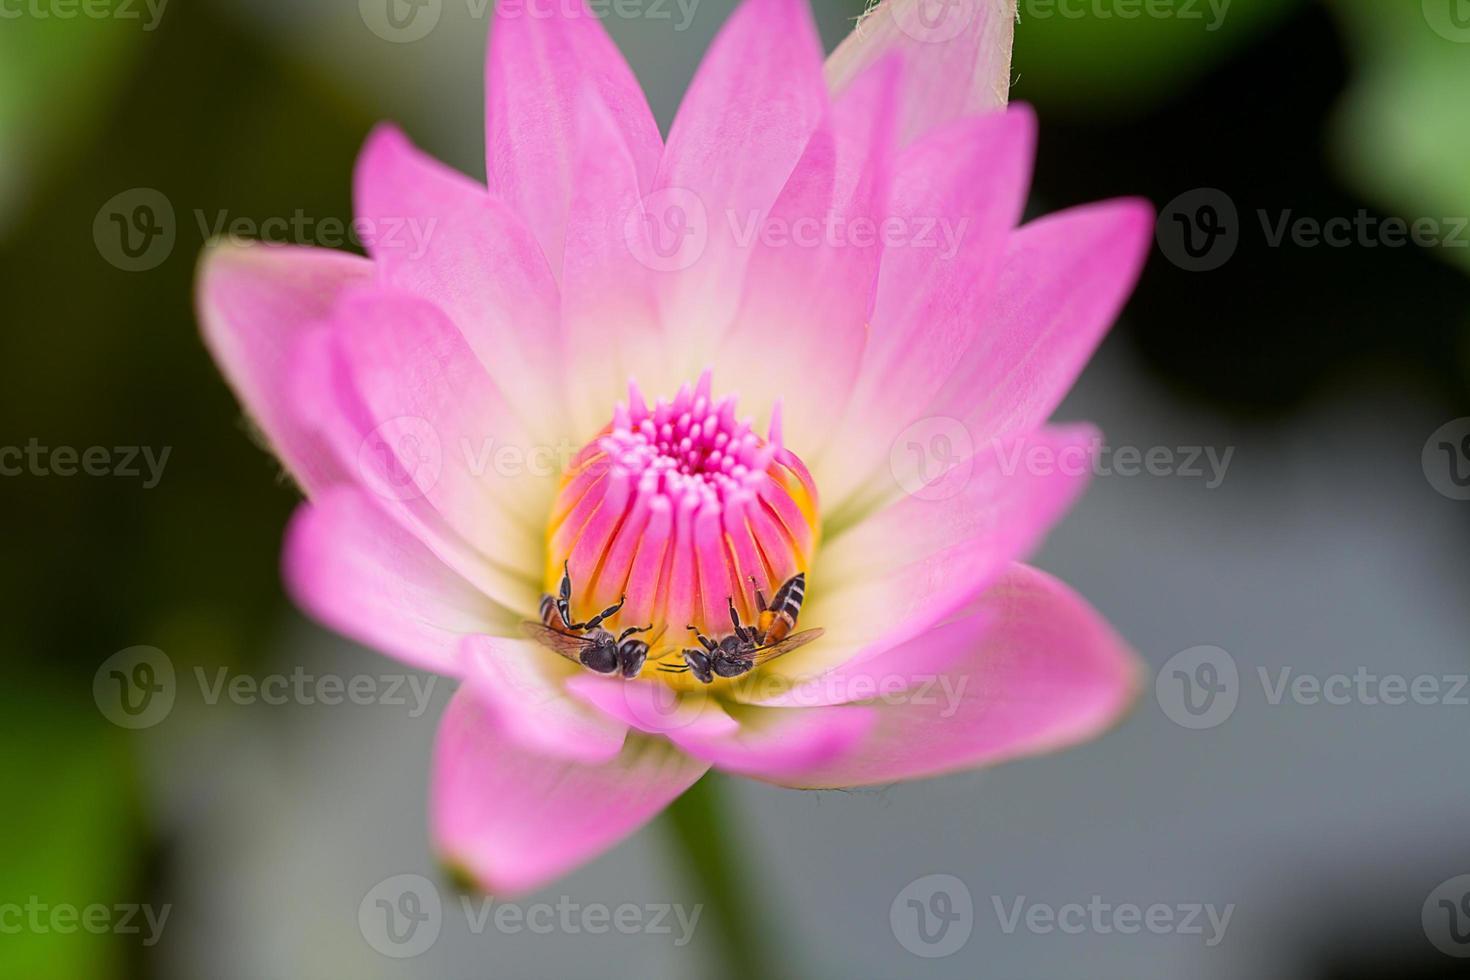 abelhinha em lótus rosa foto